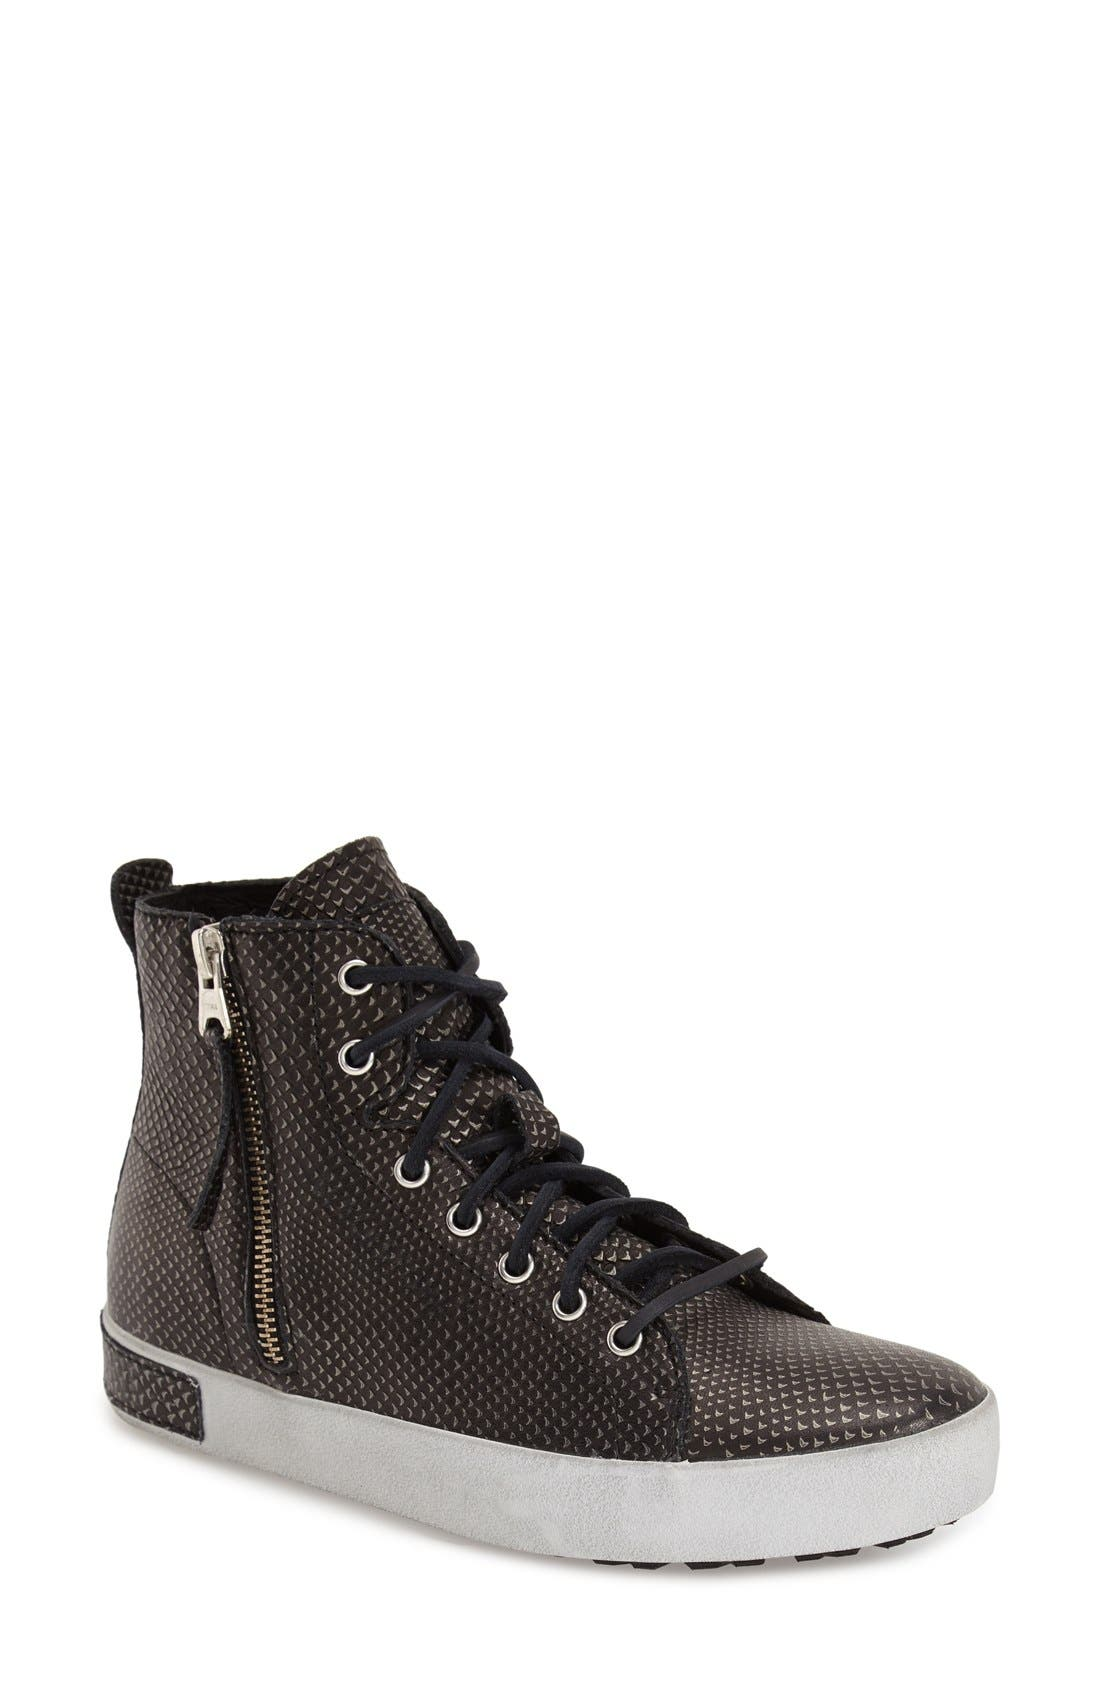 BLACKSTONE 'KL57' High Top Sneaker